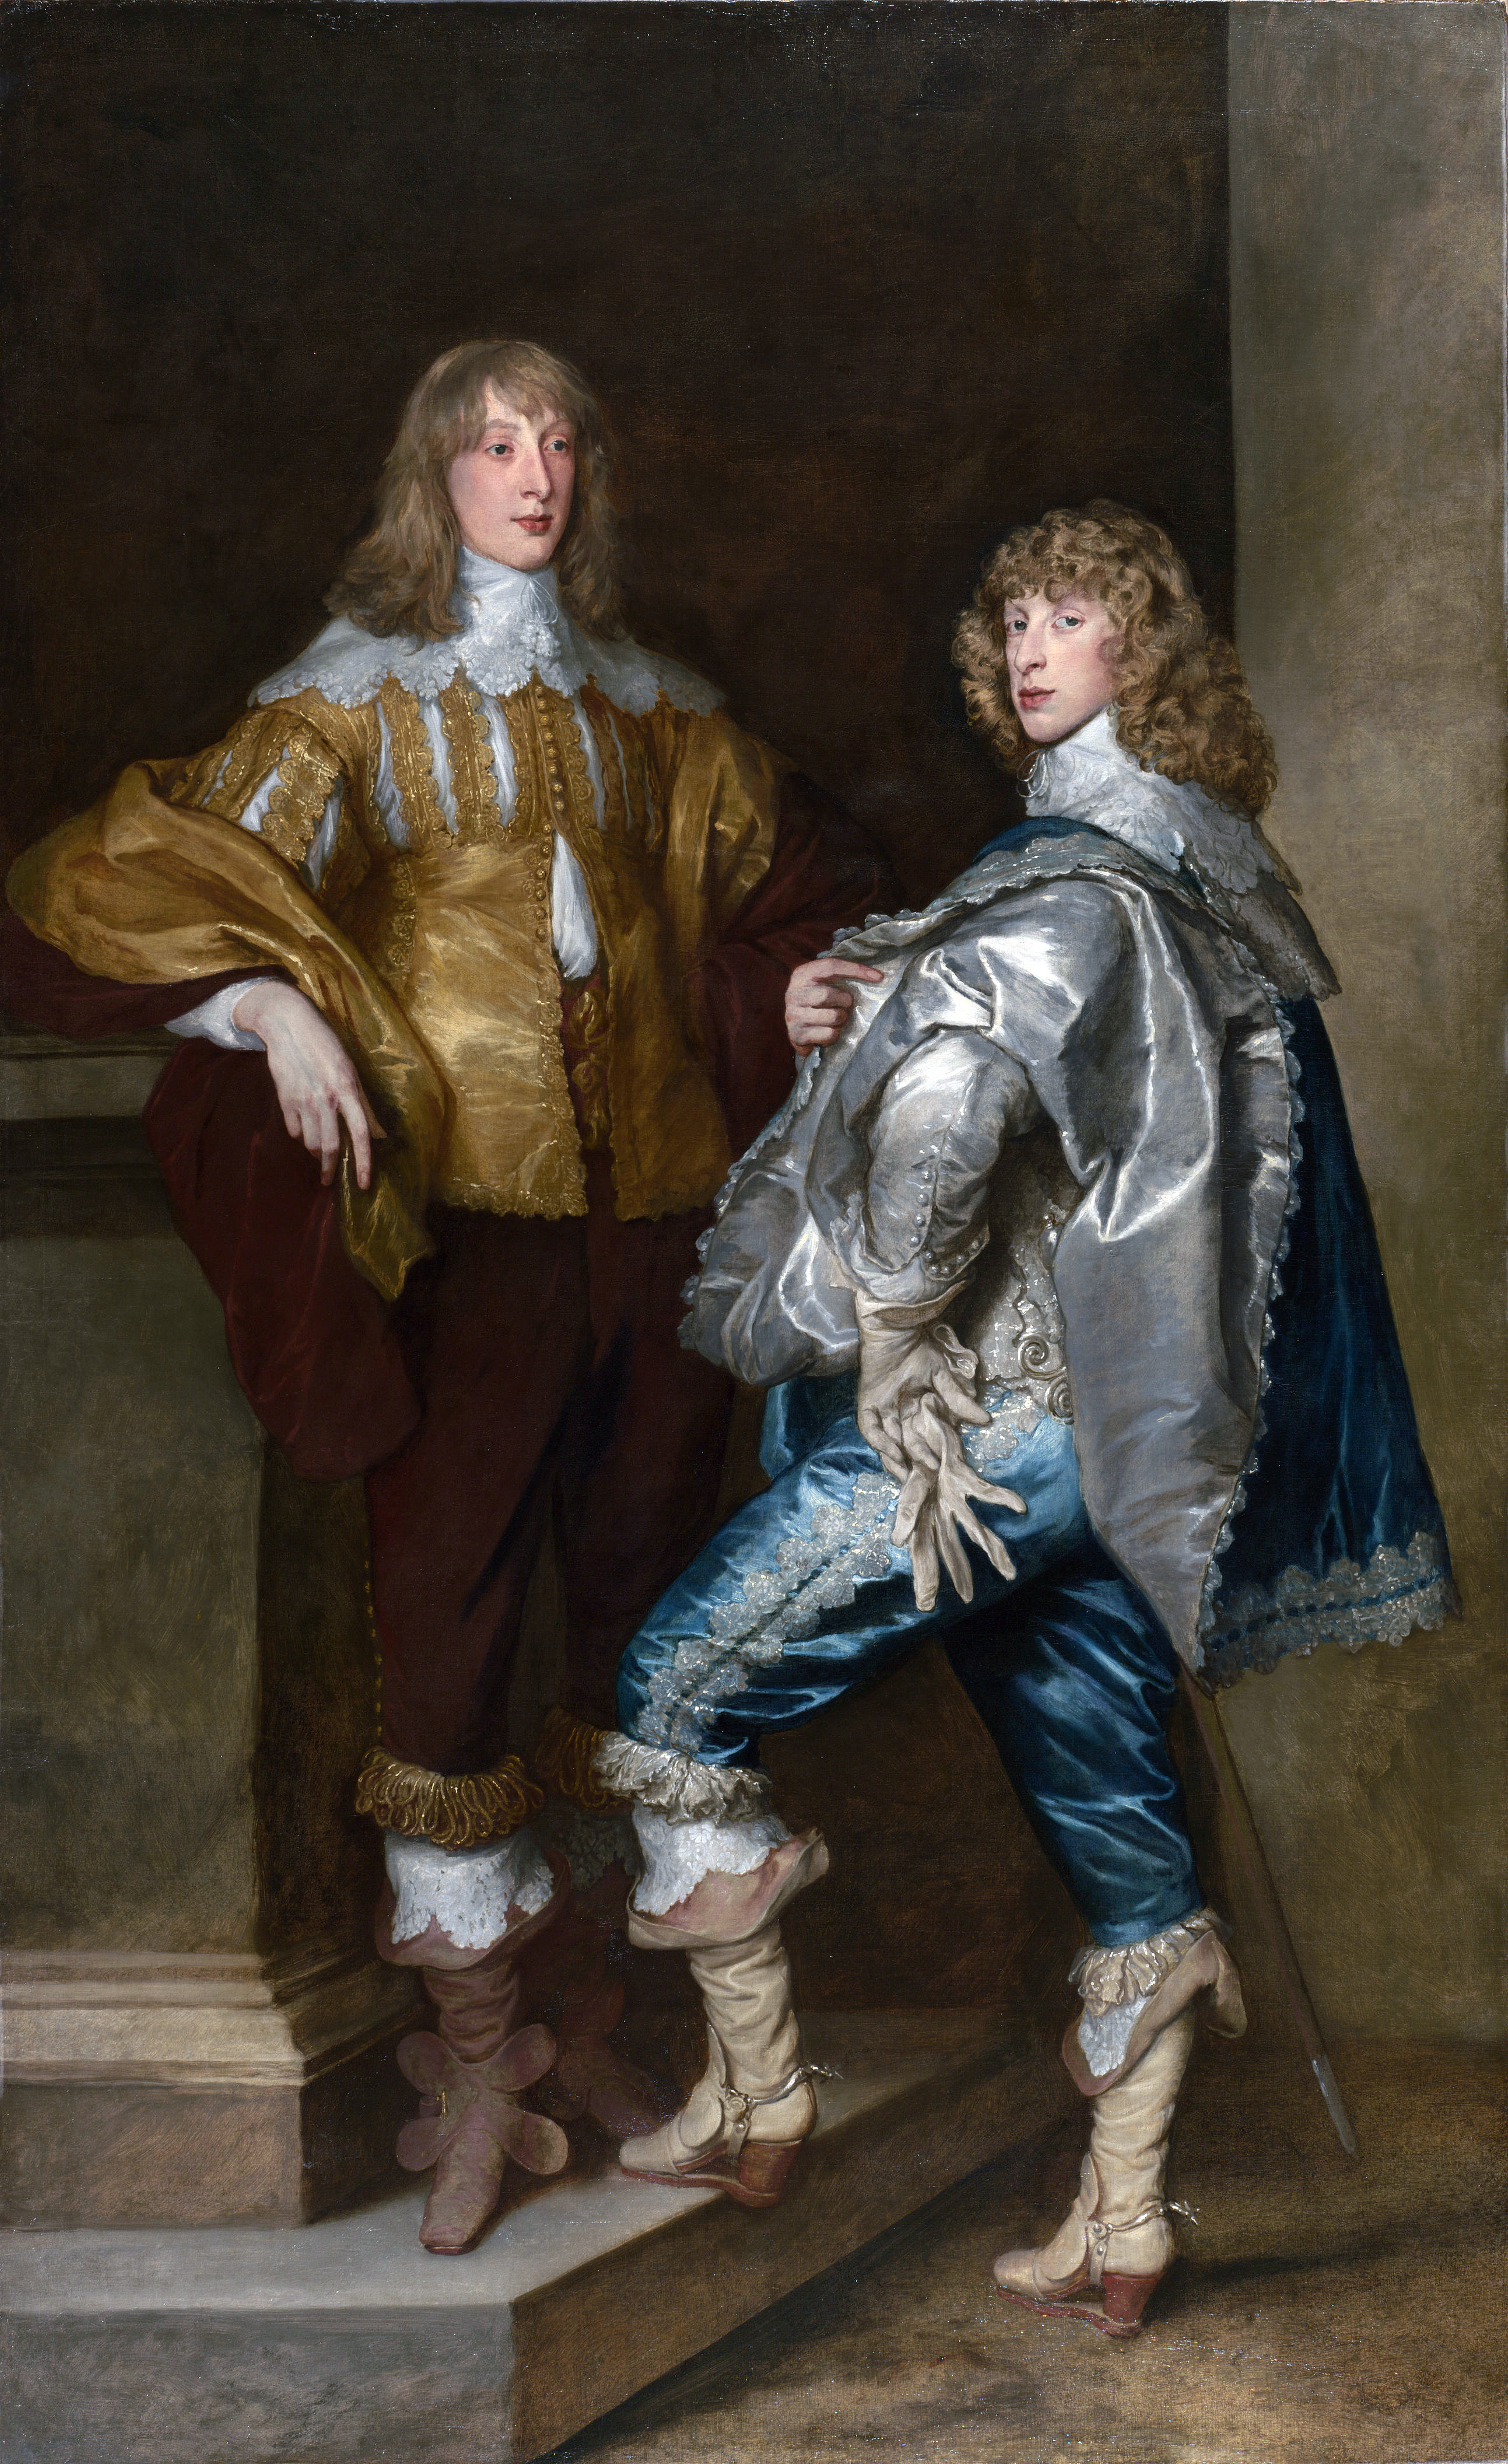 Sir-Anthony-van-Dyck-Lord-John-Stuart-and-His-Brother-Lord-Bernard-Stuart